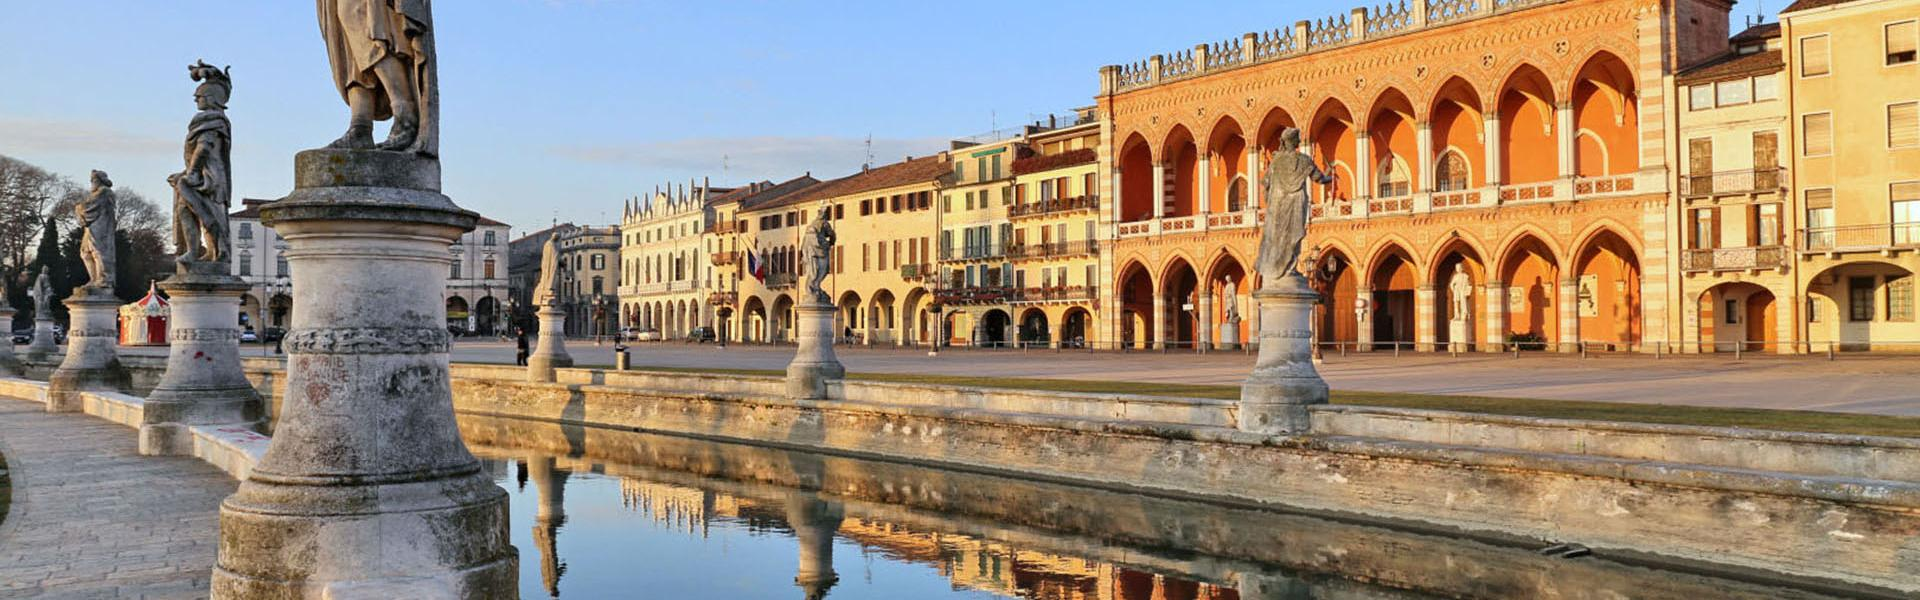 Padova Weekend ©Rossano Sanavia